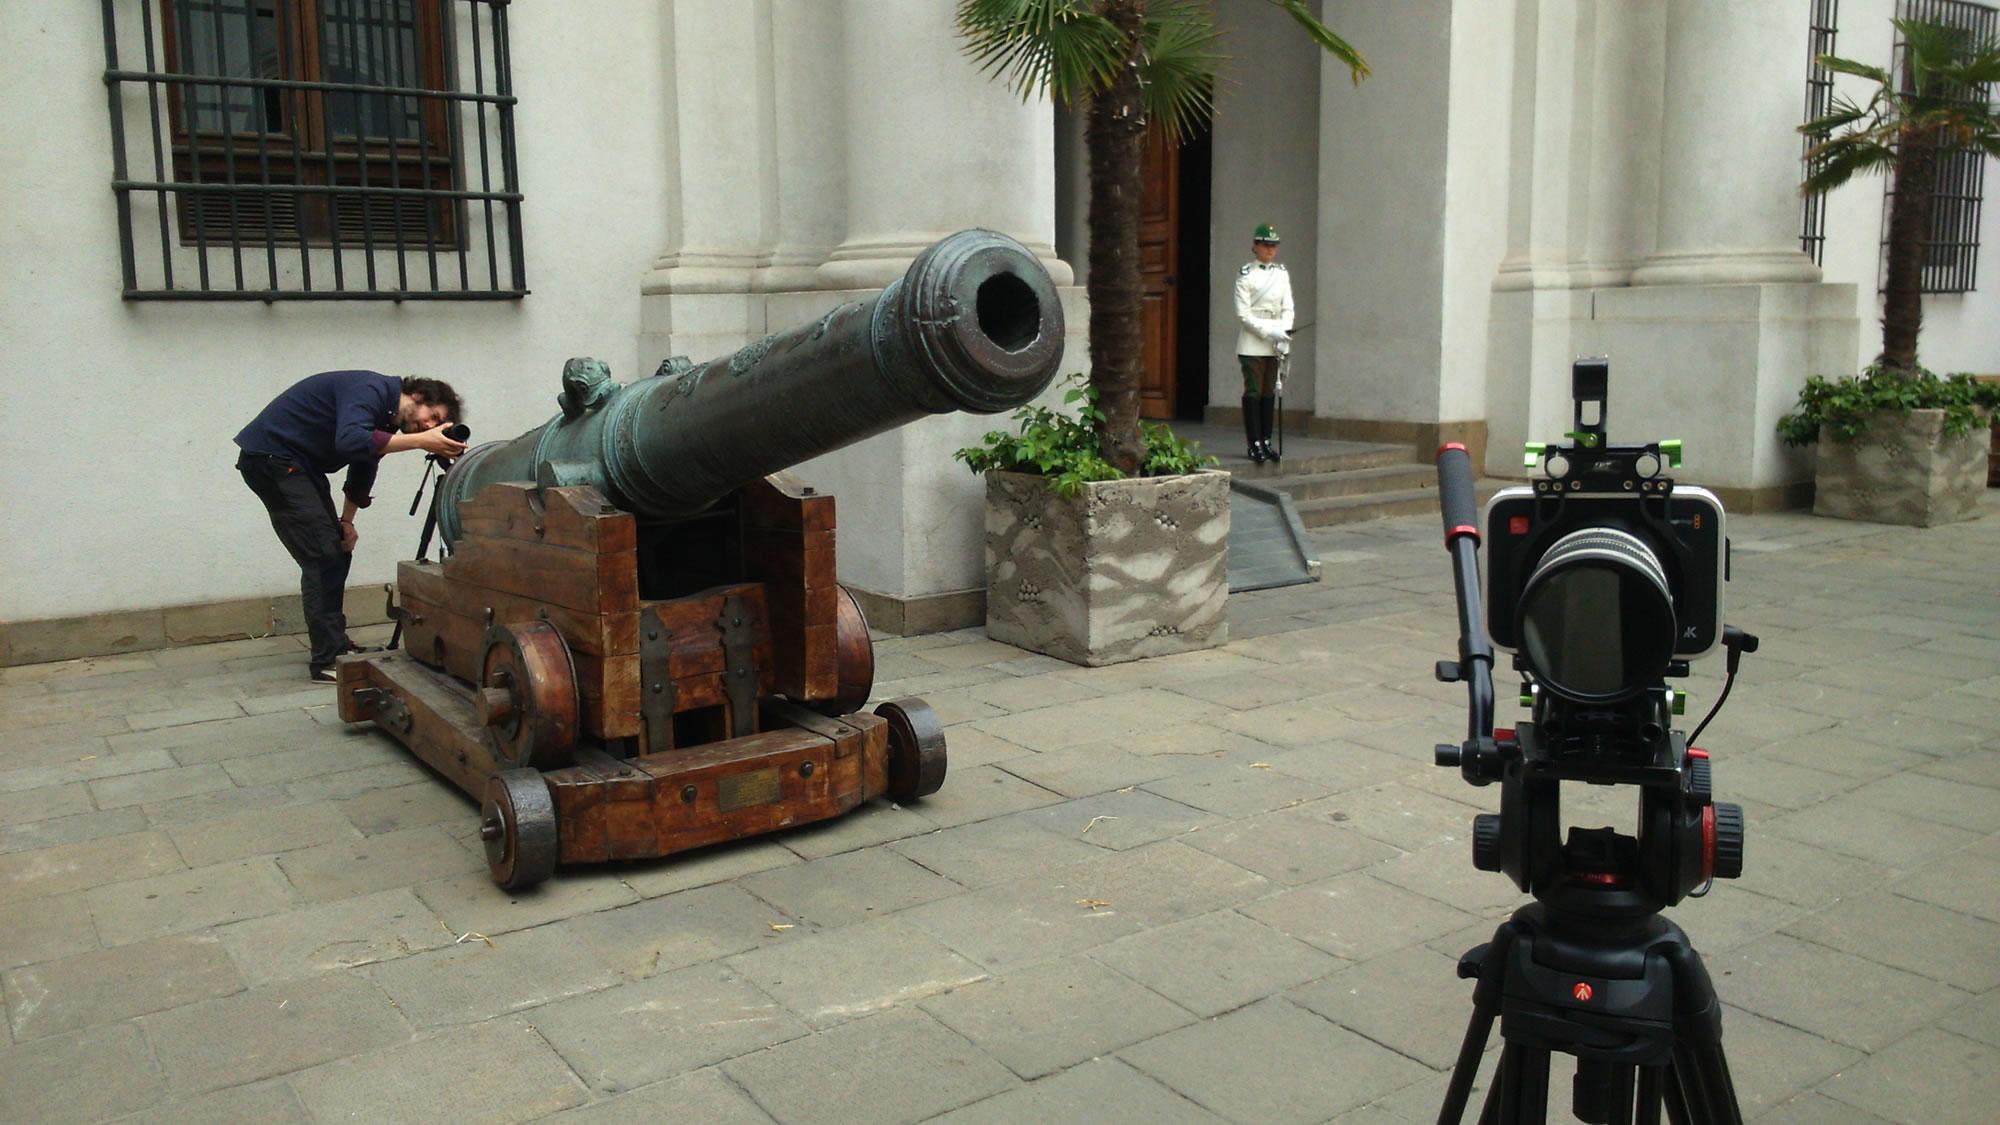 Filming at the Moneda Palace, Santigao, Chile